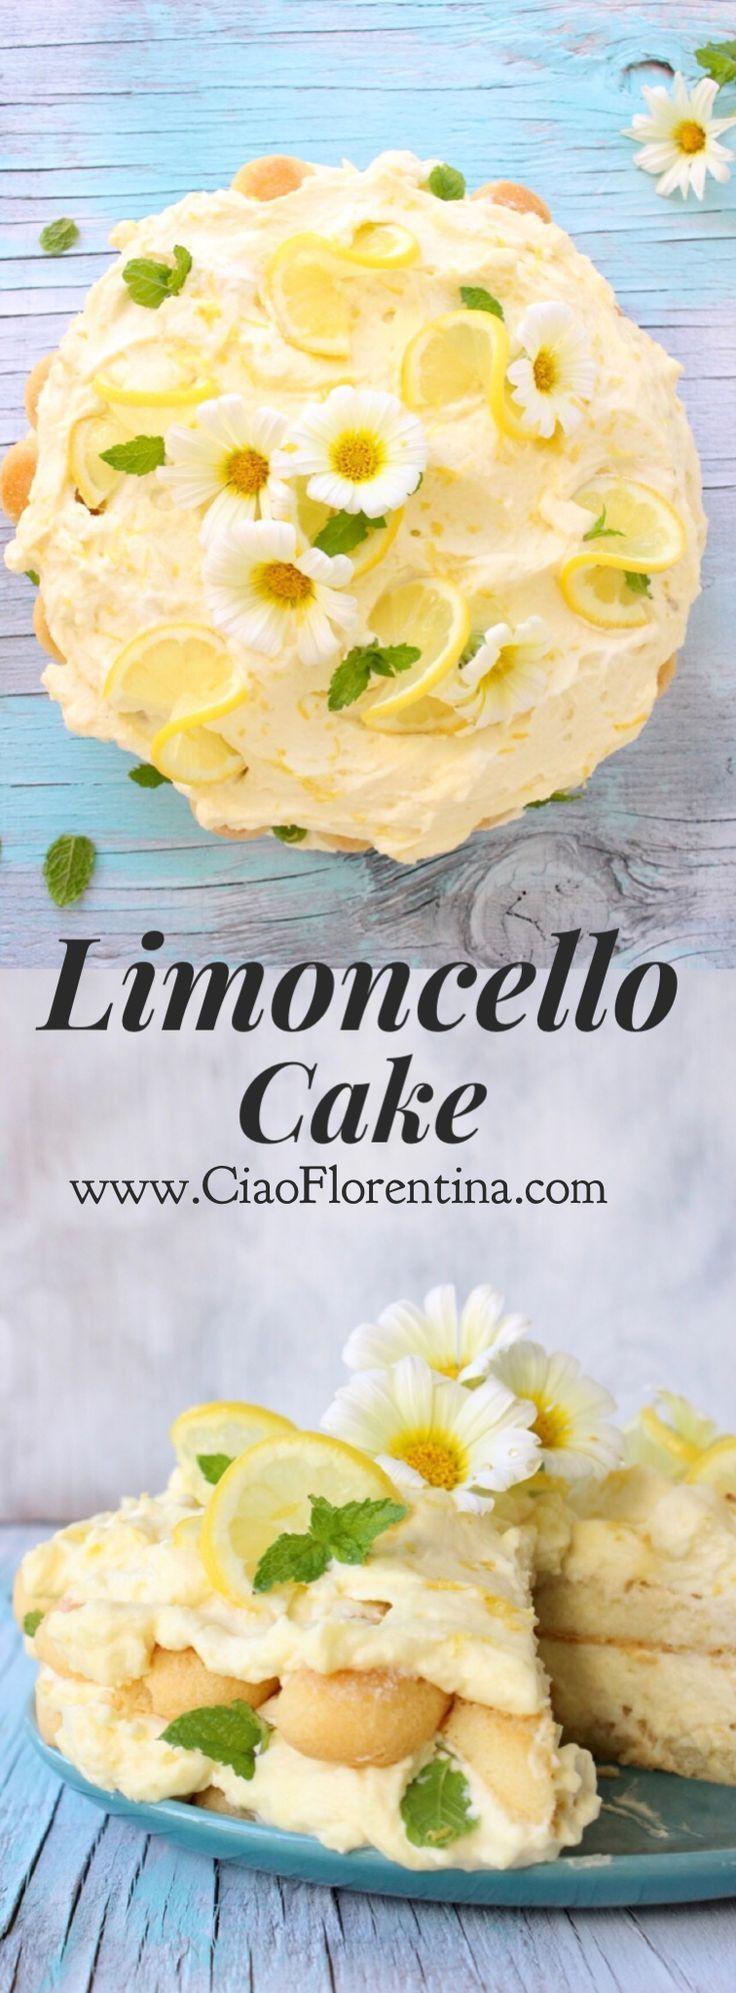 Limoncello Cake | CiaoFlorentina.com @CiaoFlorentina